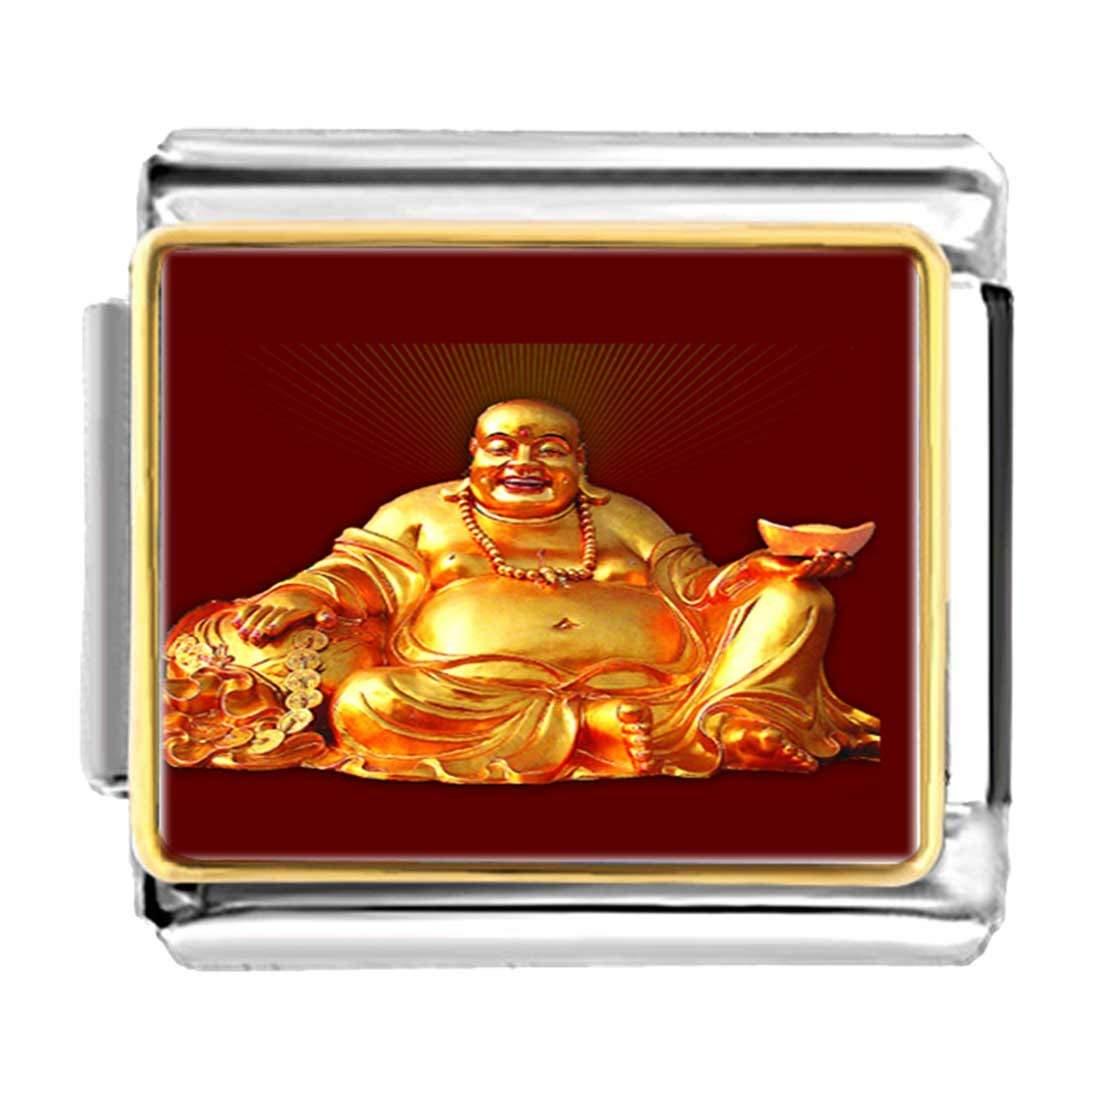 54f2446f3b Get Quotations · GiftJewelryShop Gold Plated Religion Huge Buddha Figure  Bracelet Link Photo Italian Charm Bracelets